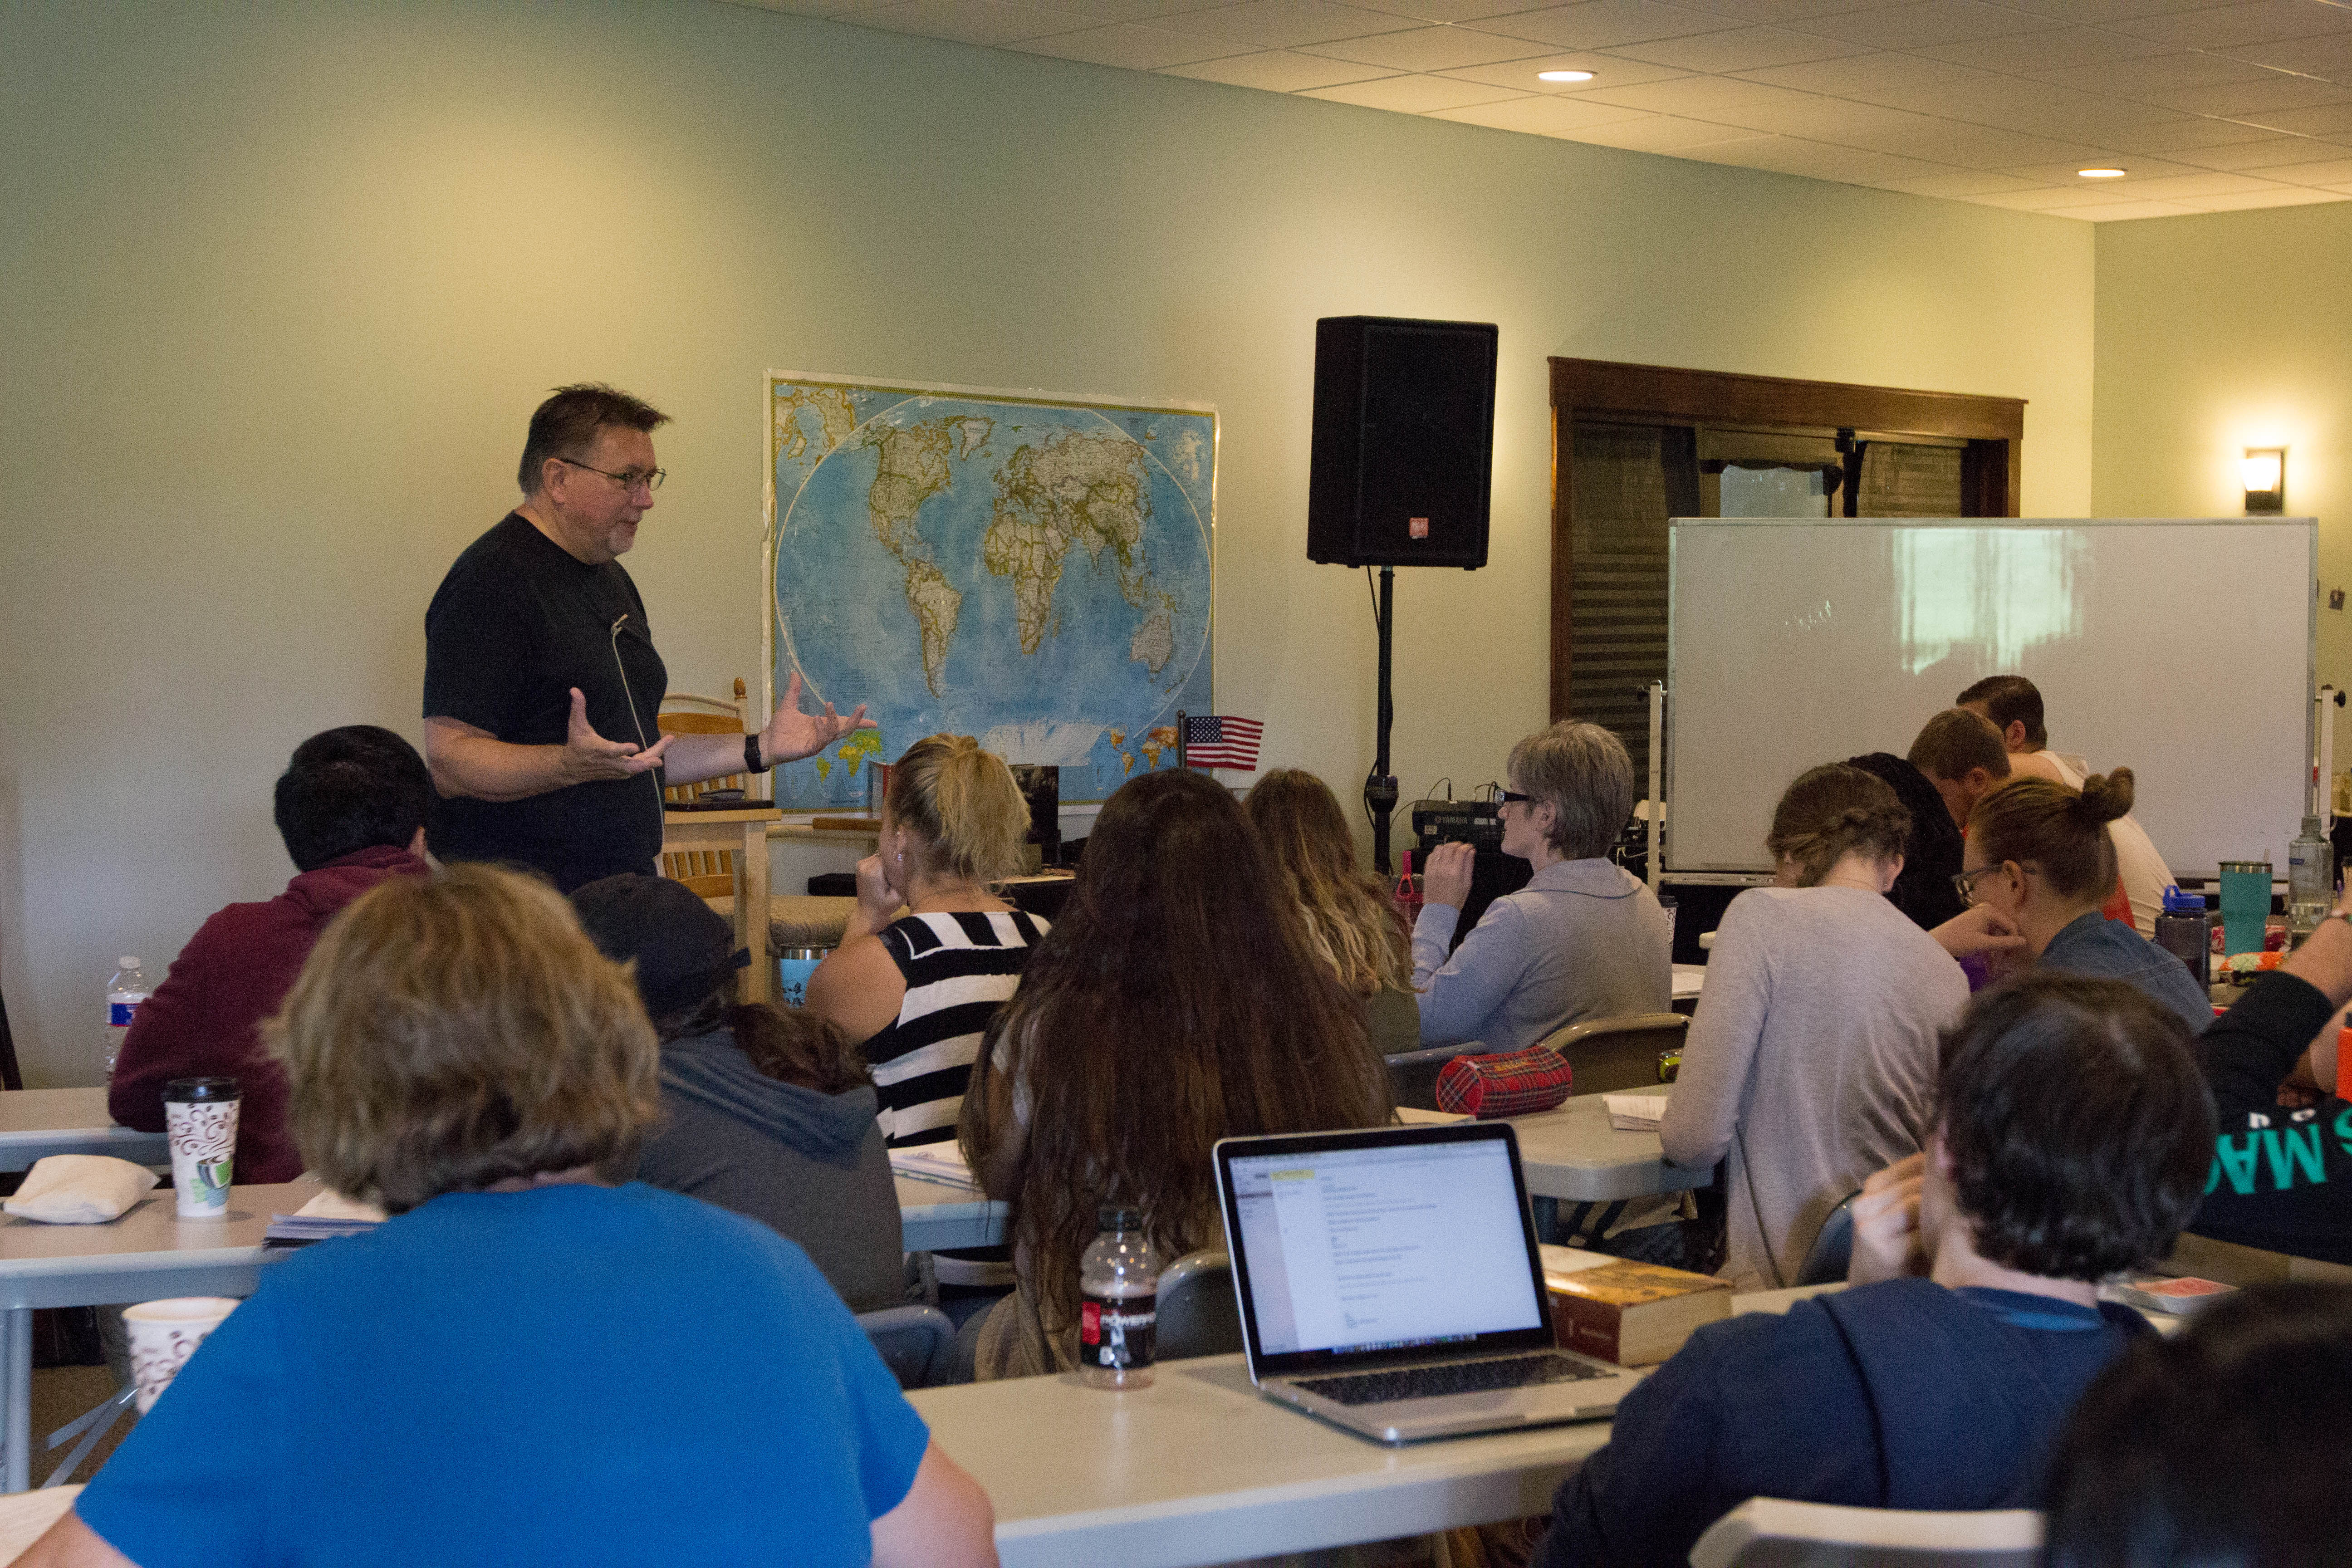 ywam-tyler-missionary-discipleship-training-school-classroom